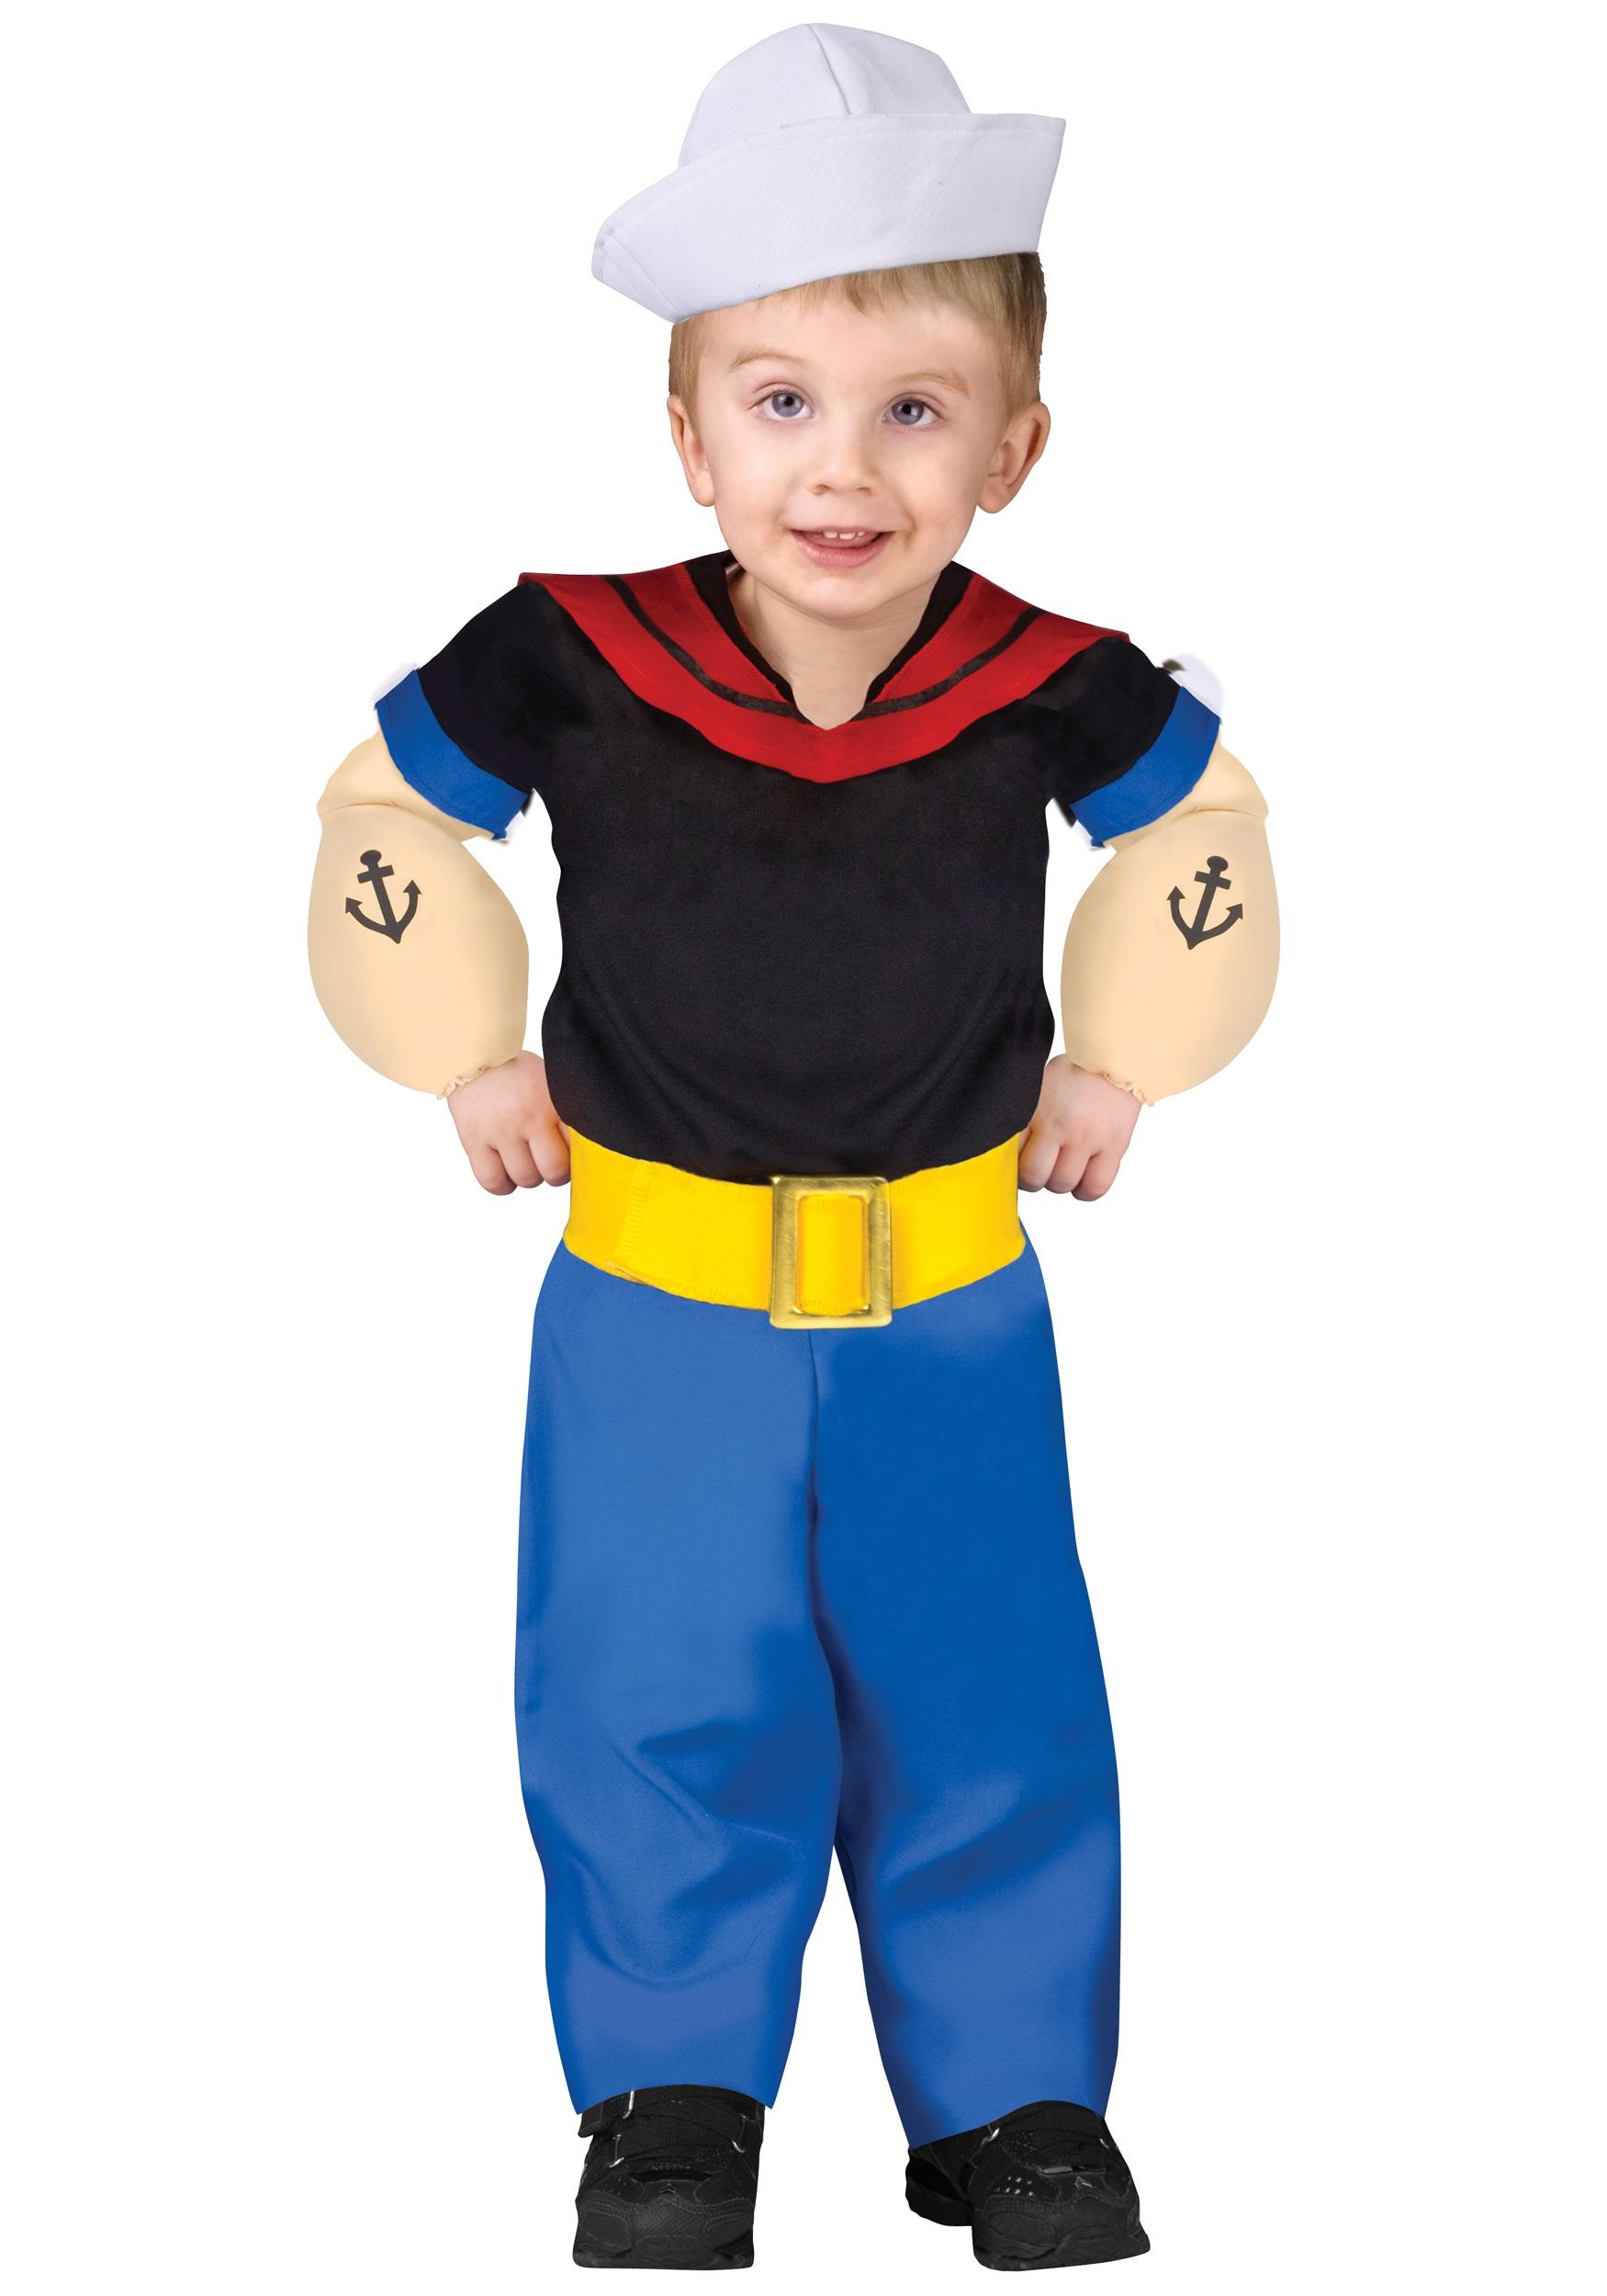 Popeye the Cartoon Toddler Costume